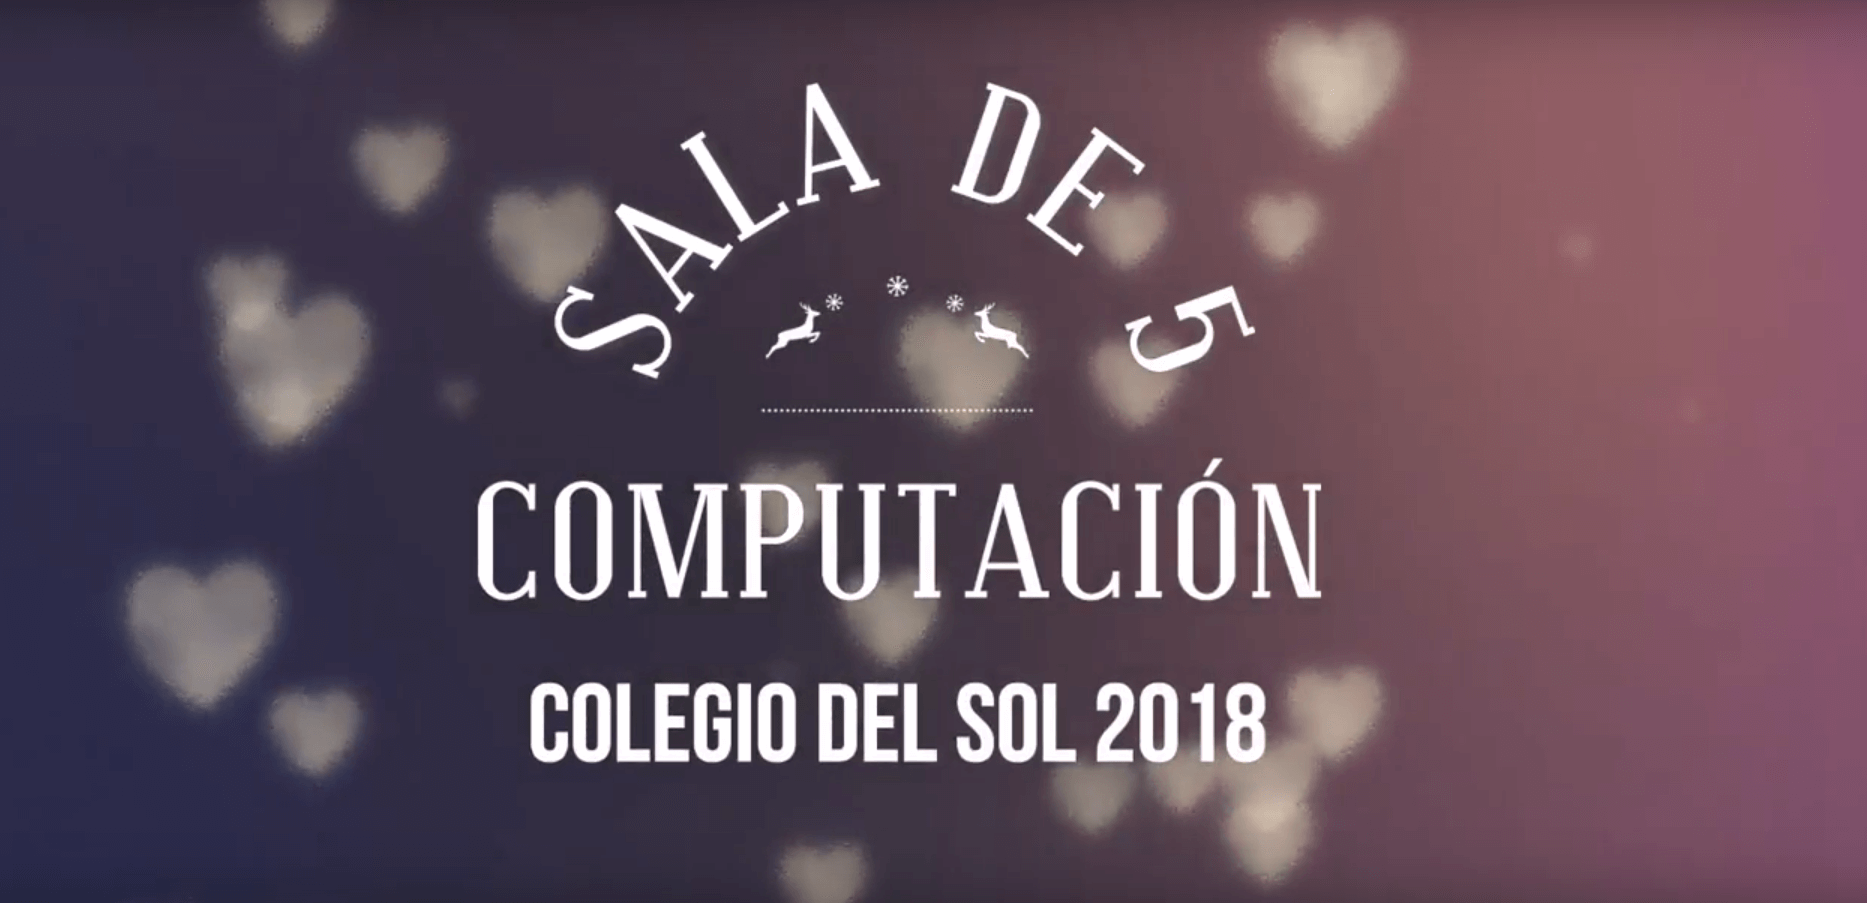 Sala de 5 en computación 2018